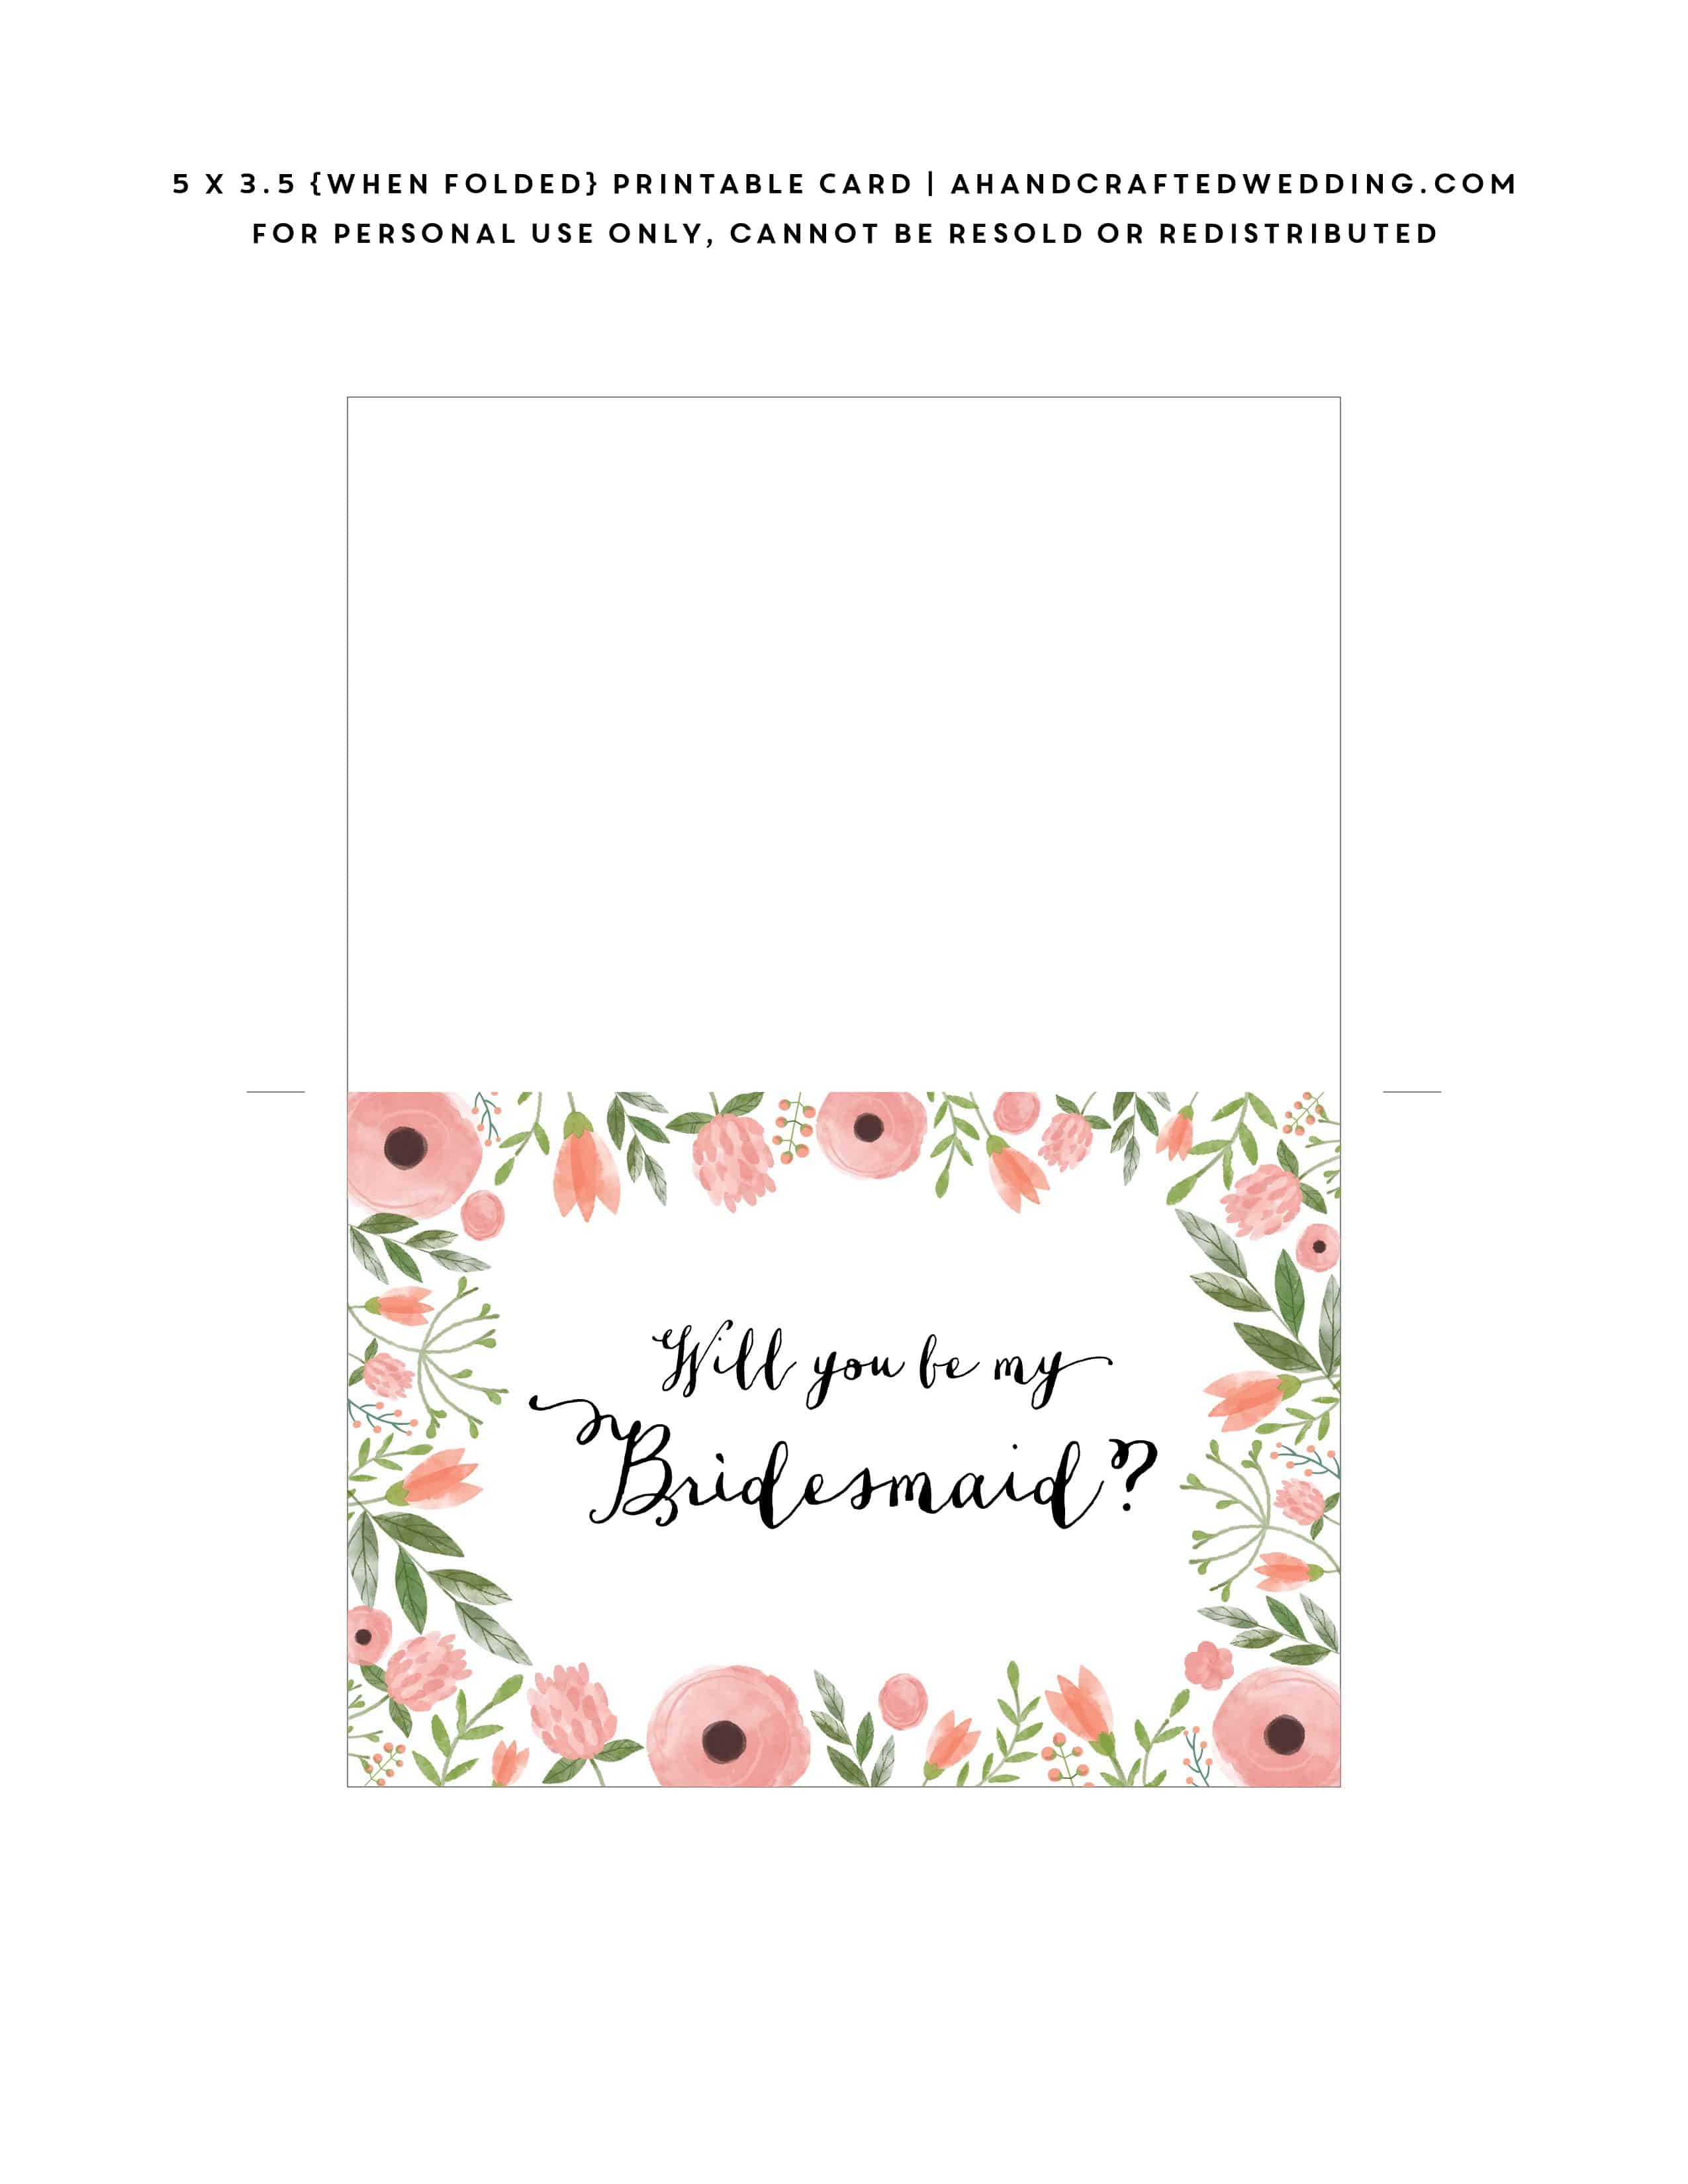 Free Printable Will You Be My Bridesmaid Card | Mountain Modern Life - Free Printable Will You Be My Bridesmaid Cards